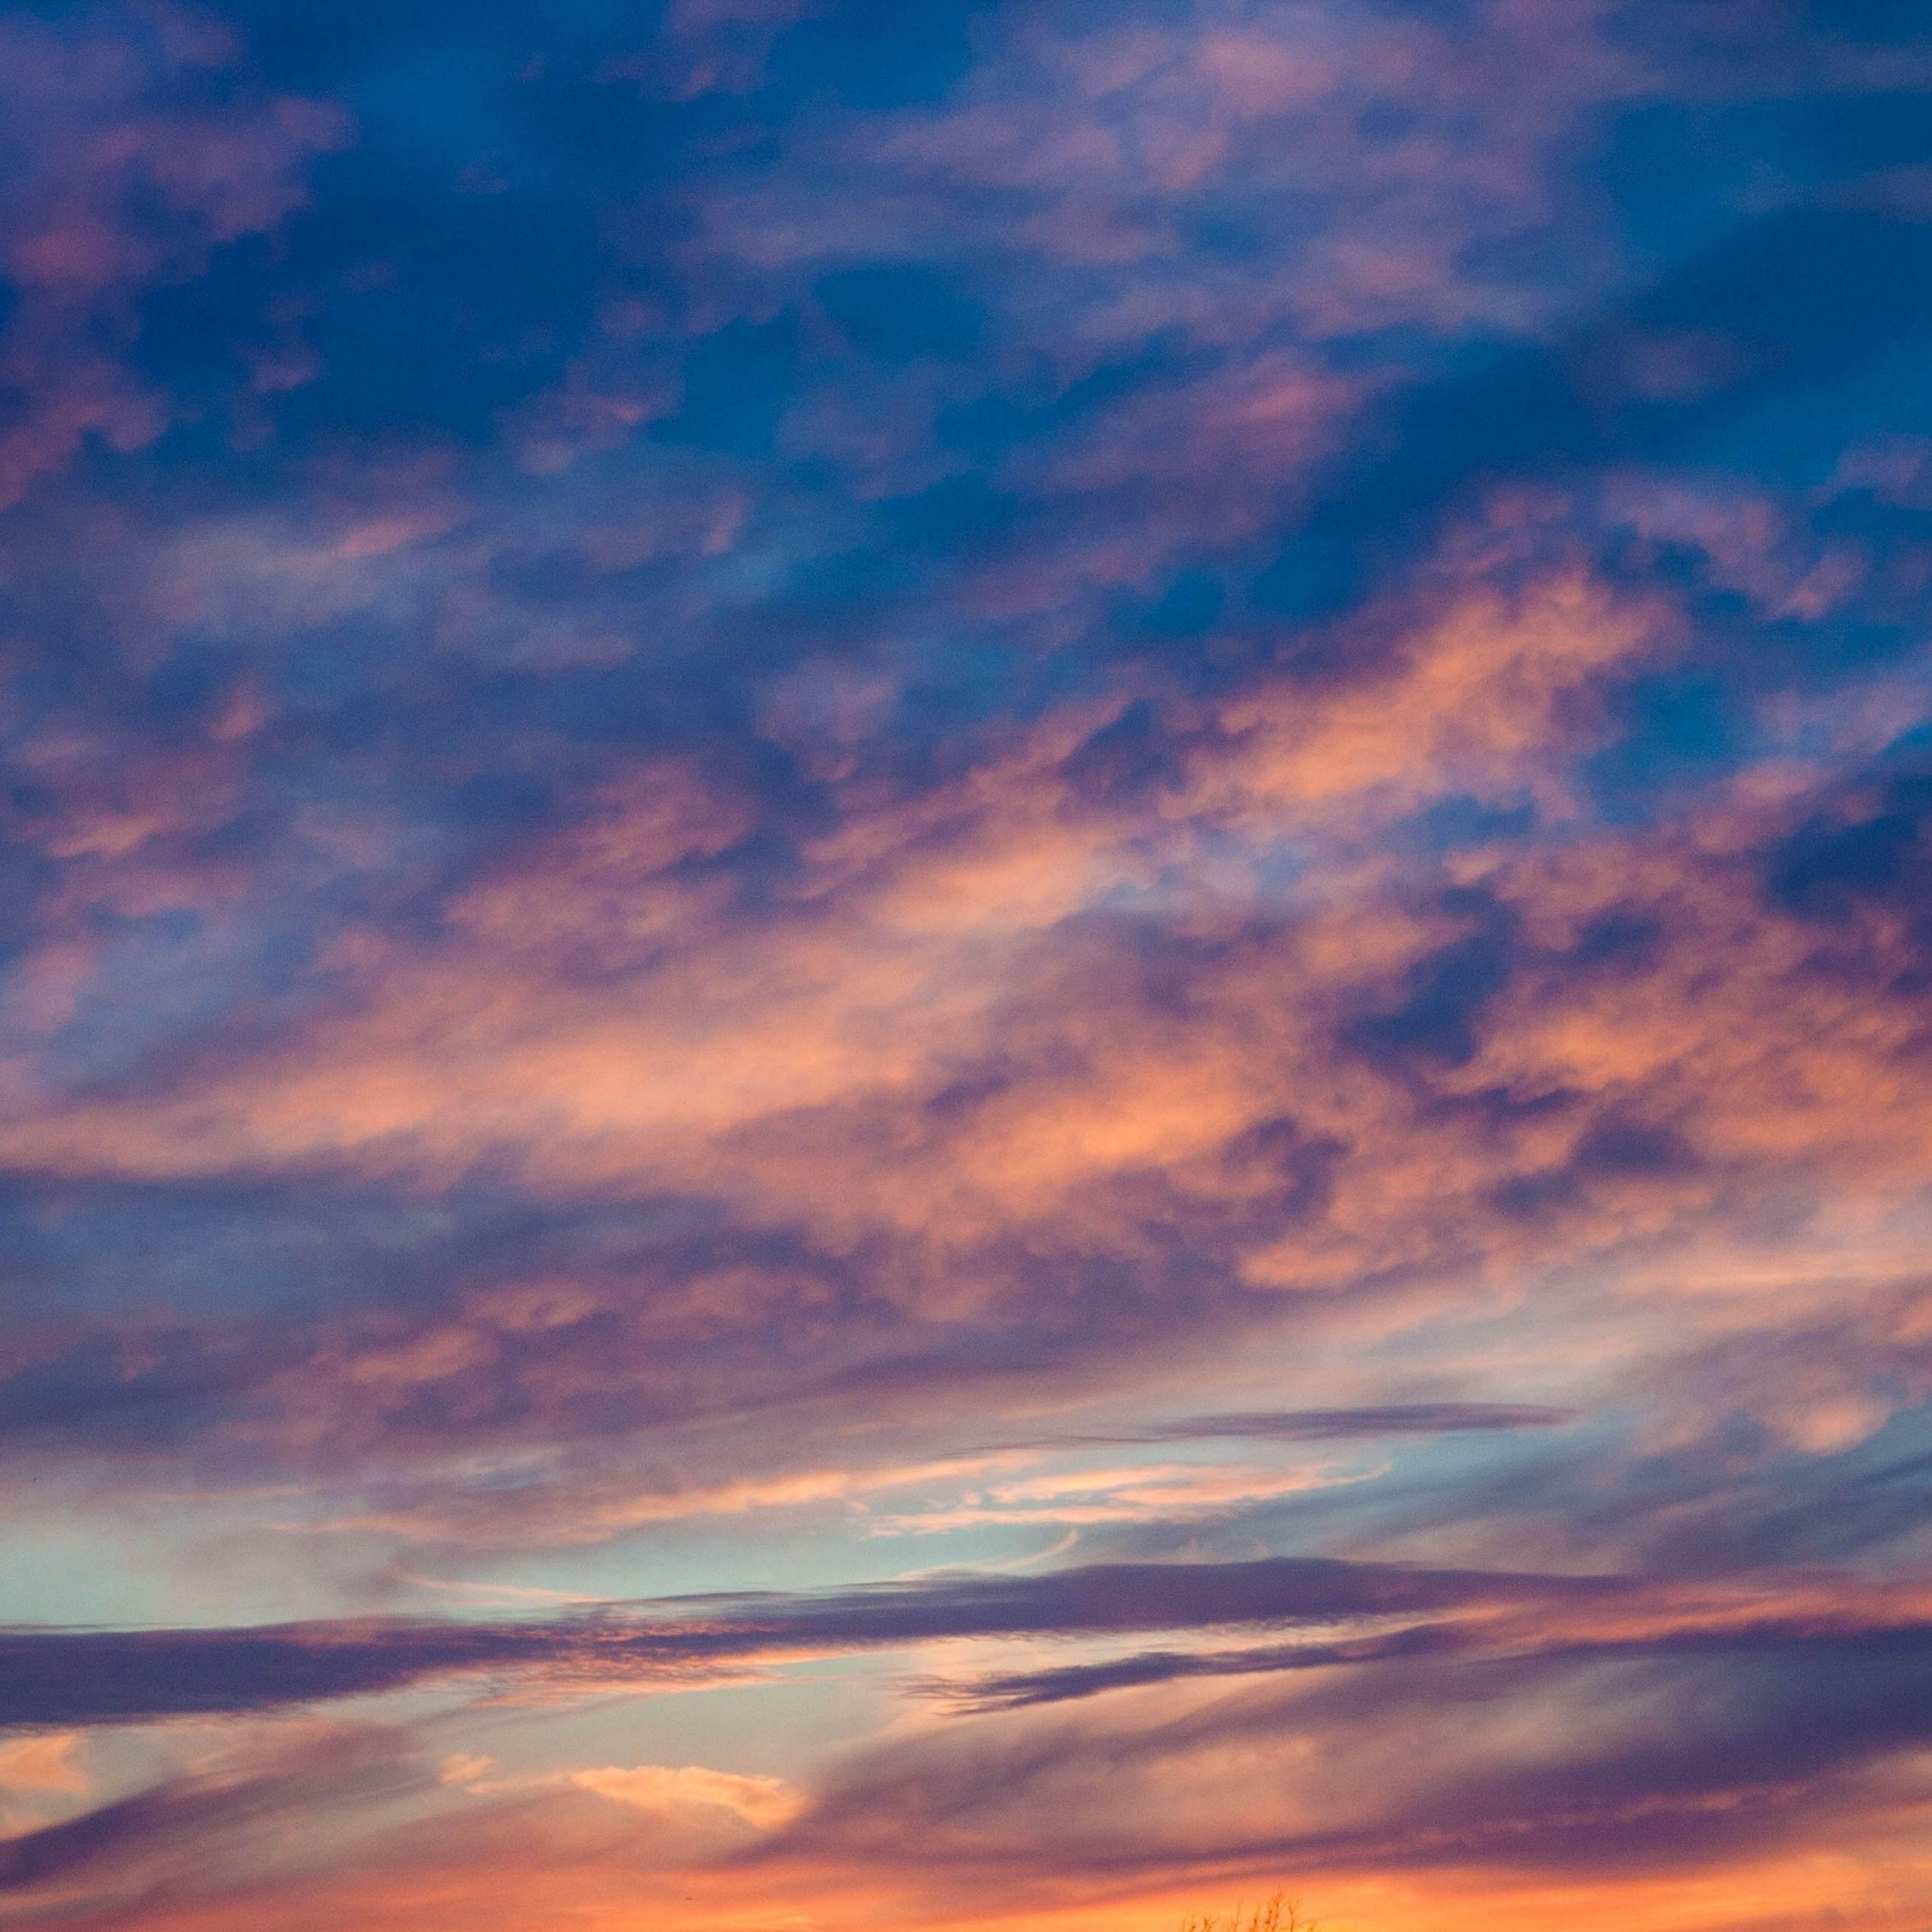 Nature Clouds Sunset Porous Ipad Pro Wallpaper Ipad Pro Wallpaper Clouds Wallpaper